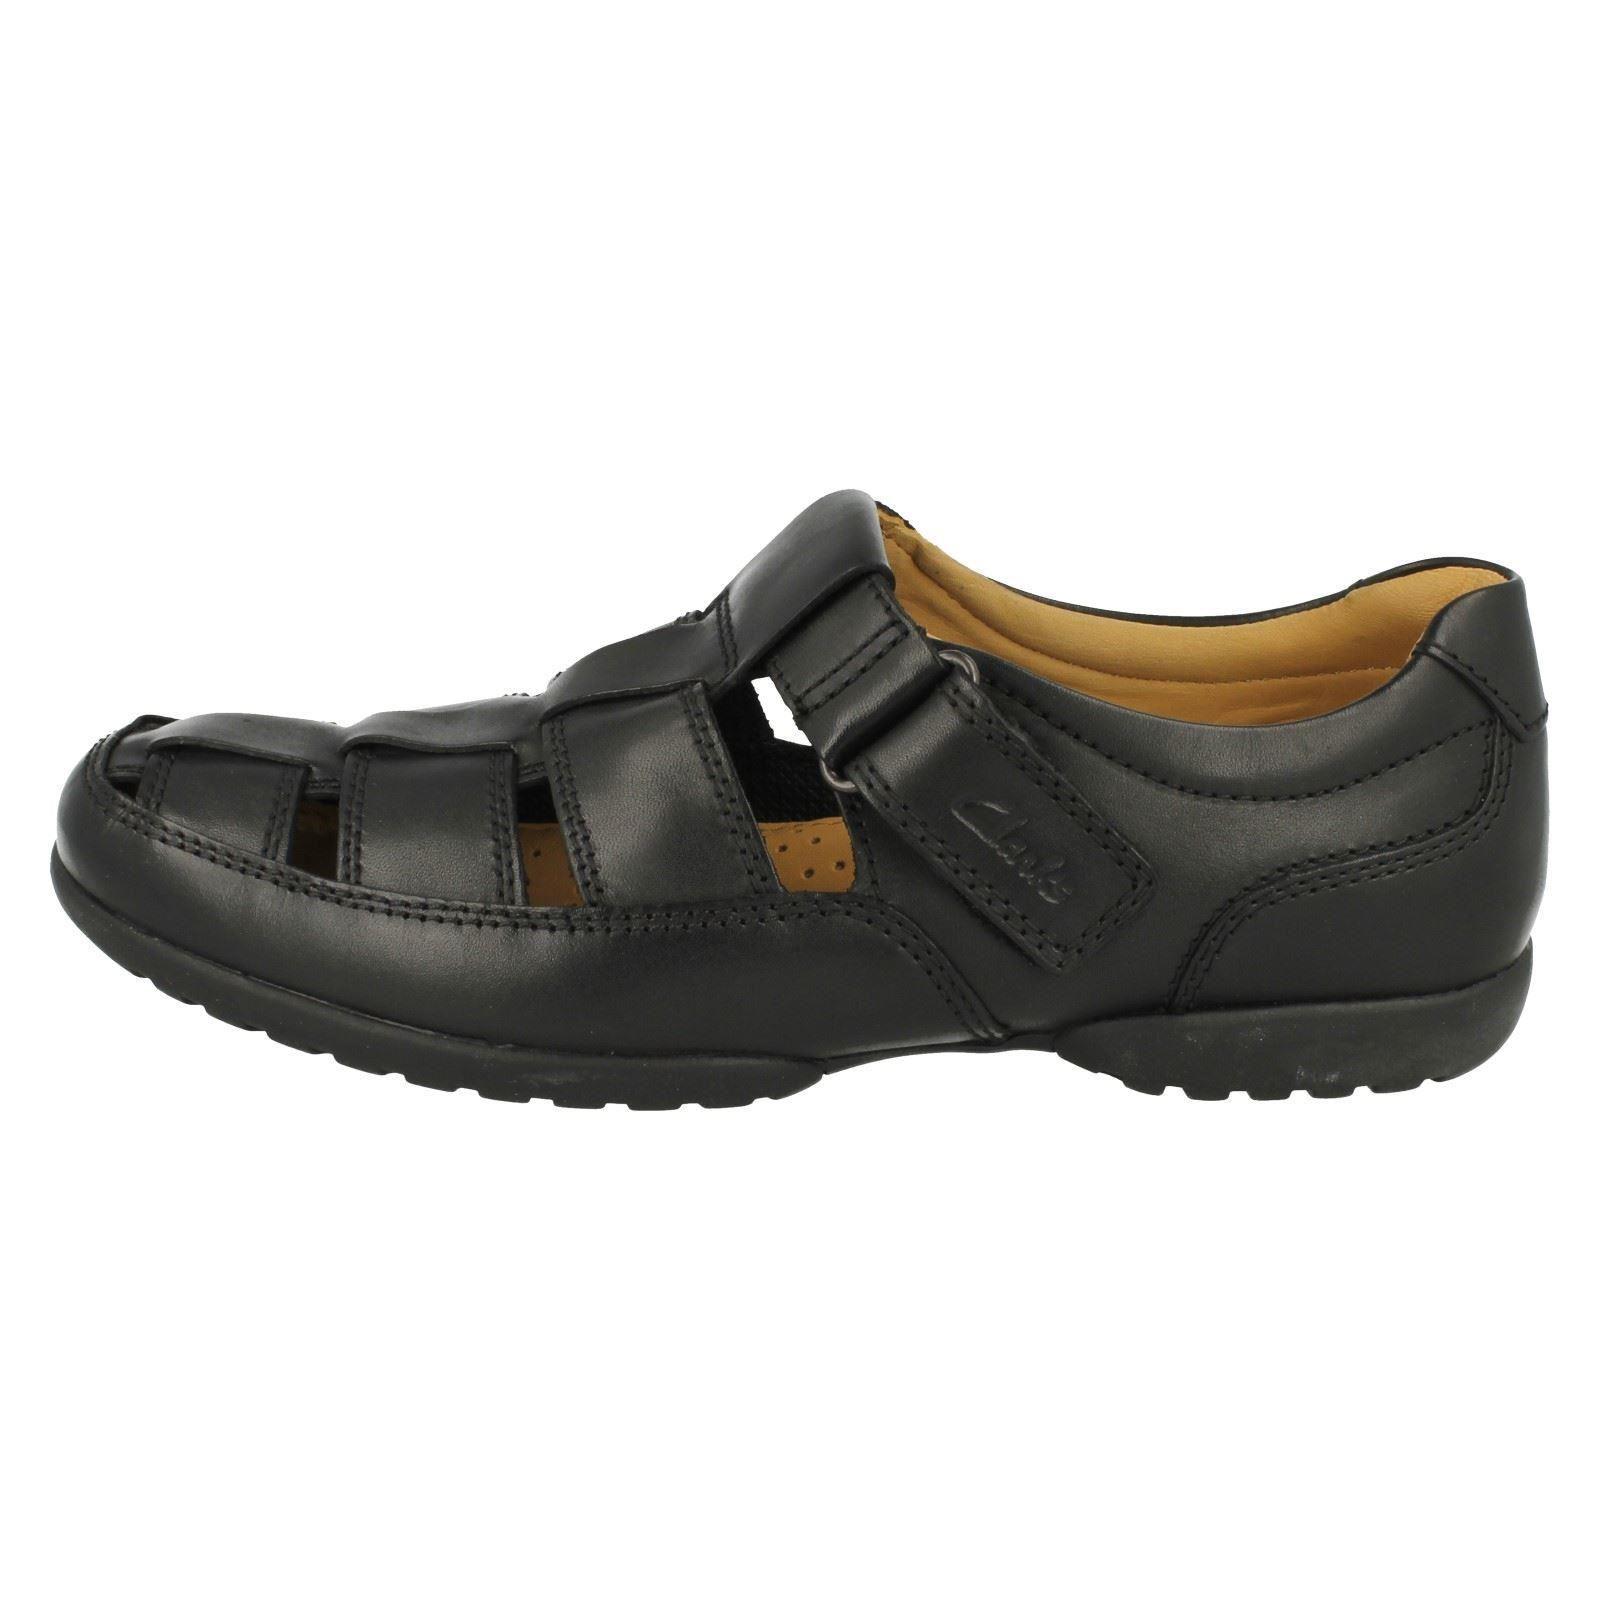 Black sandals debenhams -  Picture 3 Of 19